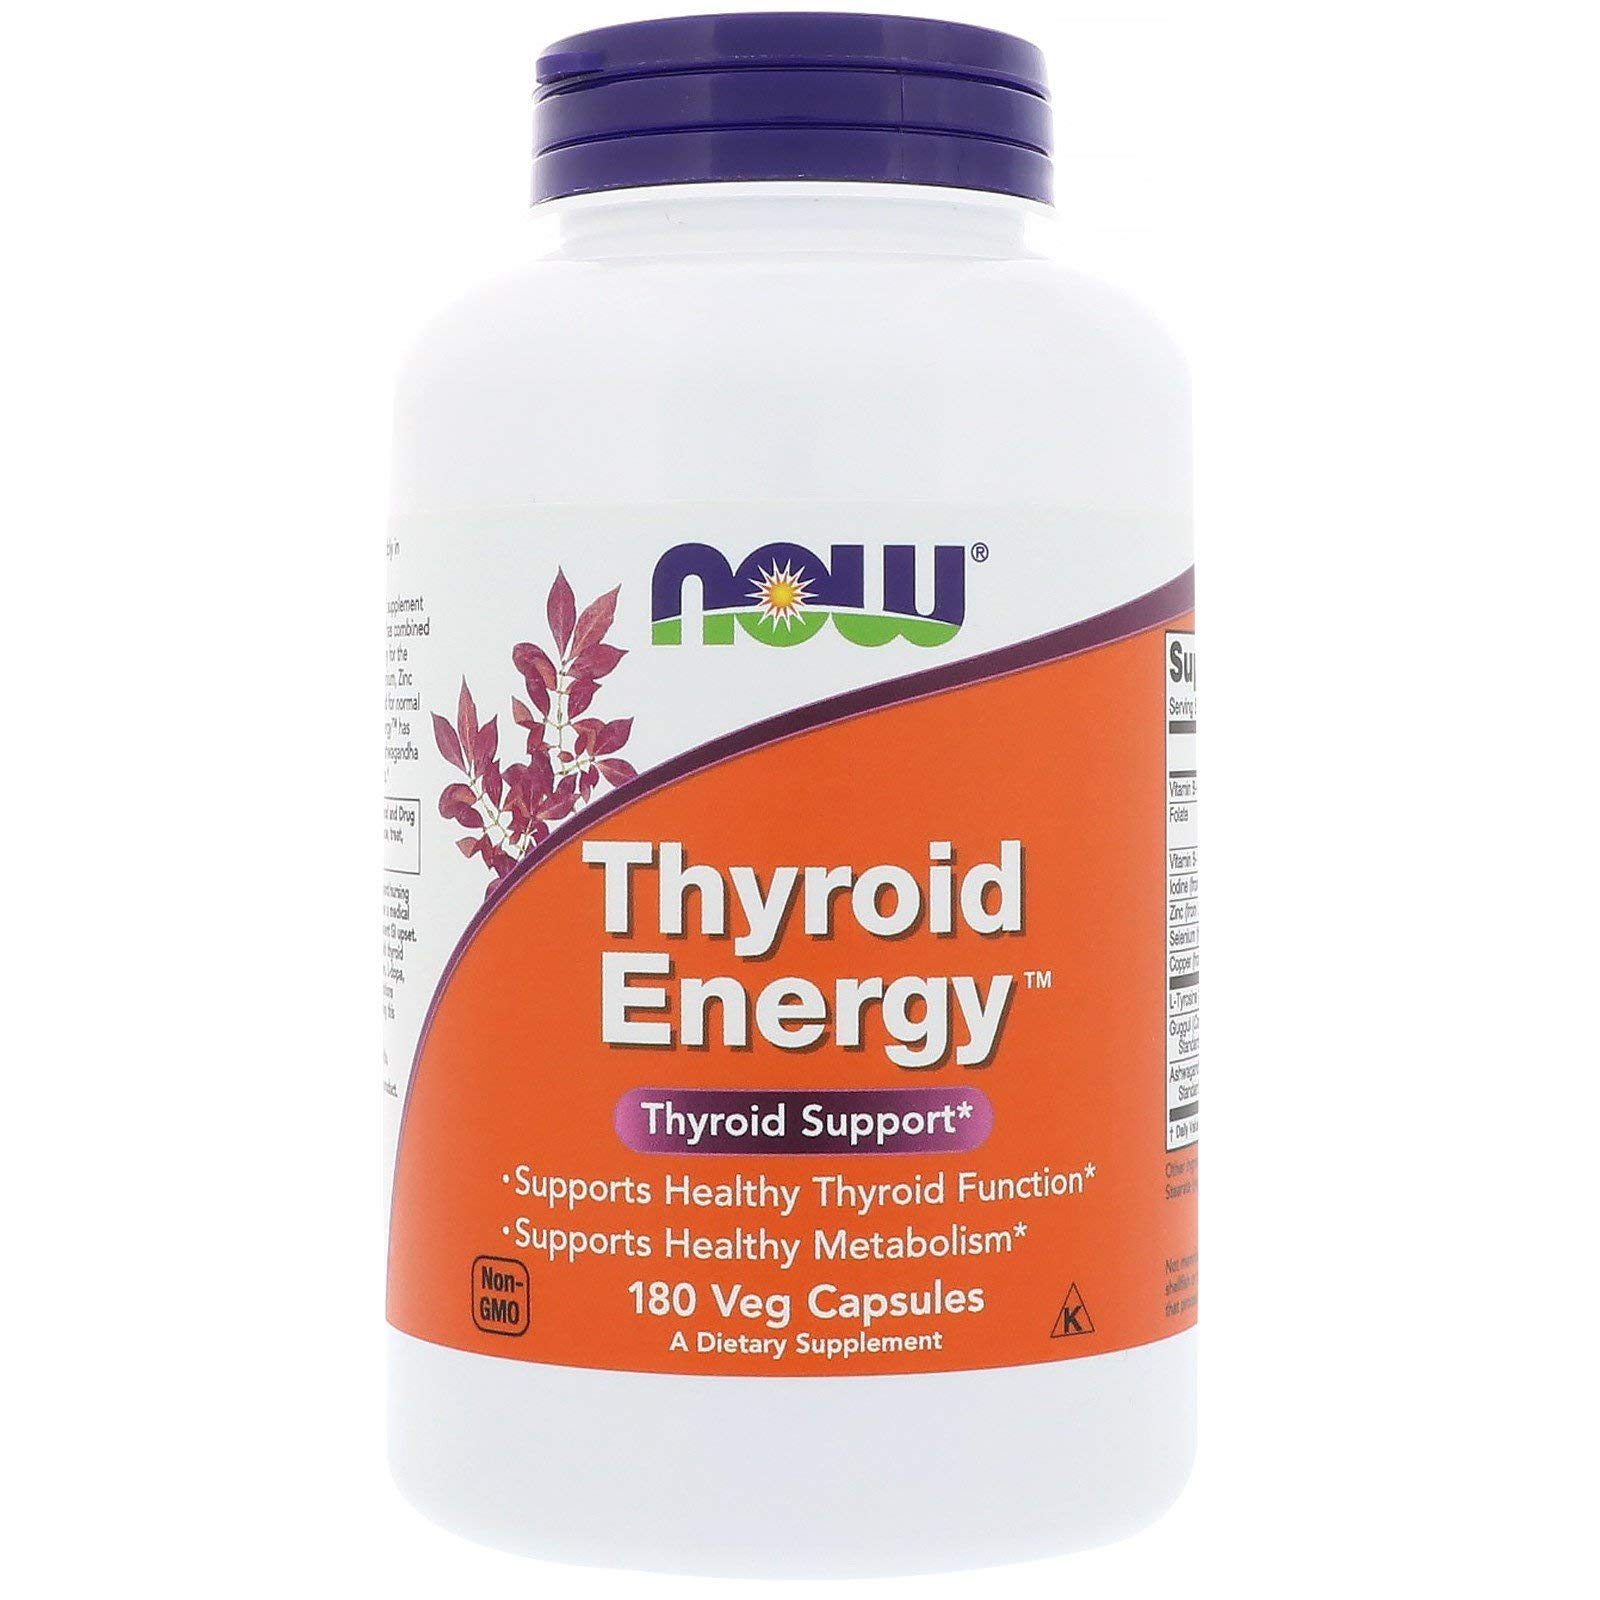 NOW Foods Thyroid Energy Veg Capsules (180 Capsules, Pack of 2)